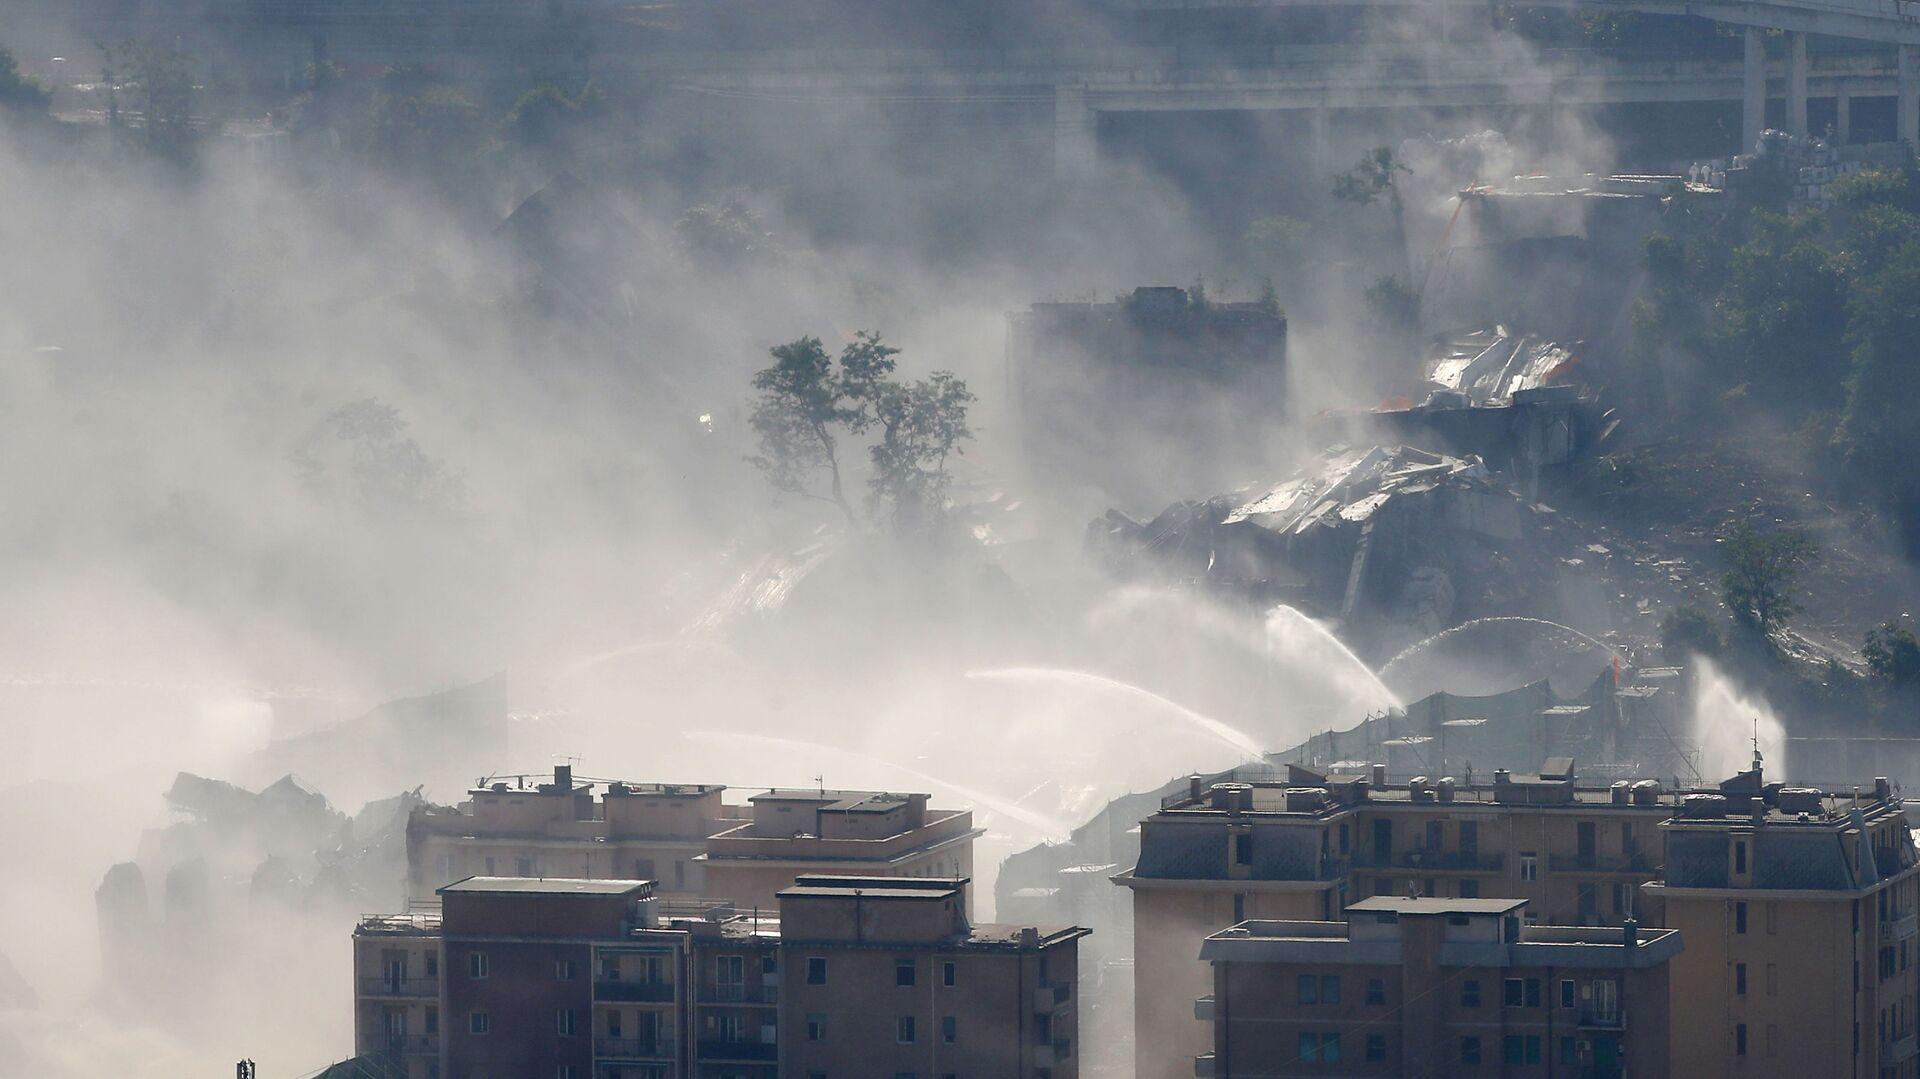 Dopo la demolizione del ponte Morandi a Genova, 26.08.2019 - Sputnik Italia, 1920, 14.08.2021